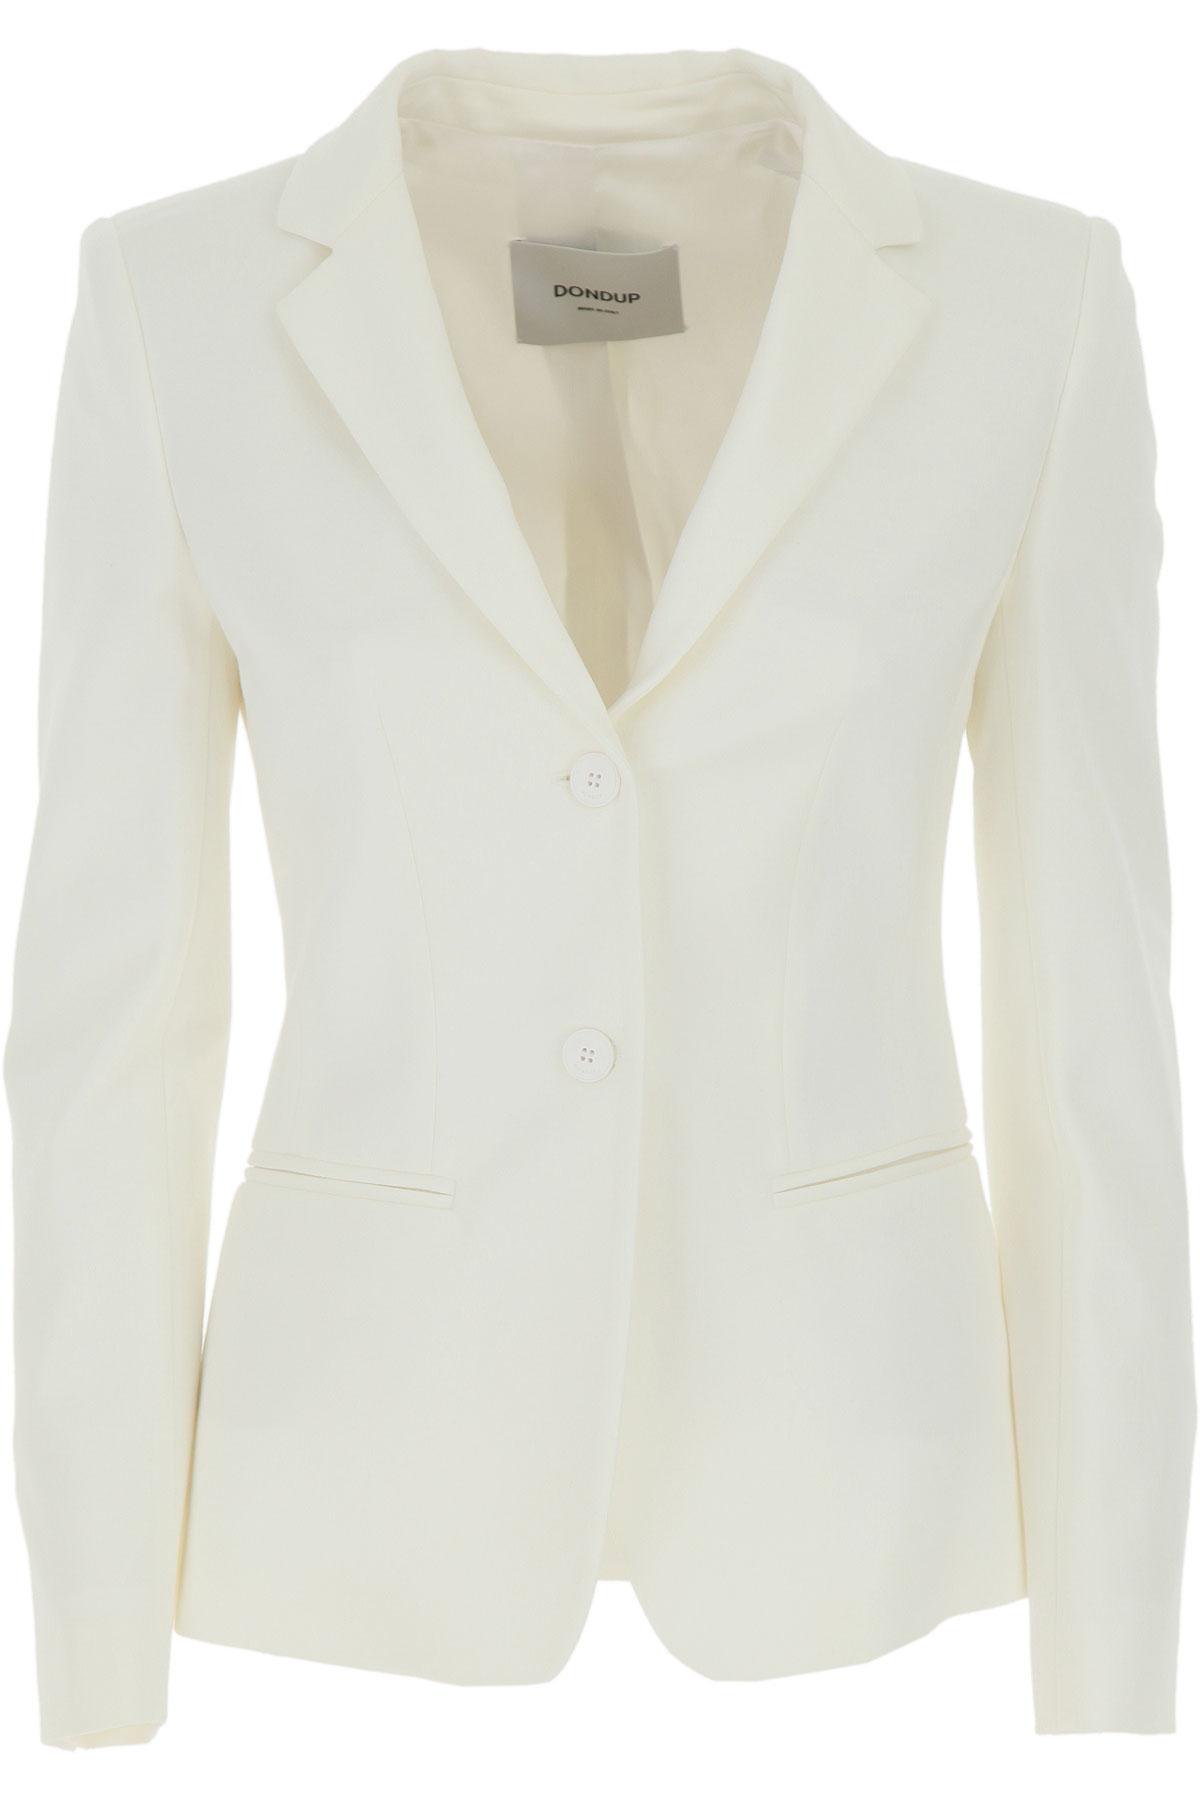 Dondup Blazer for Women On Sale, White, Viscose, 2019, 4 6 8